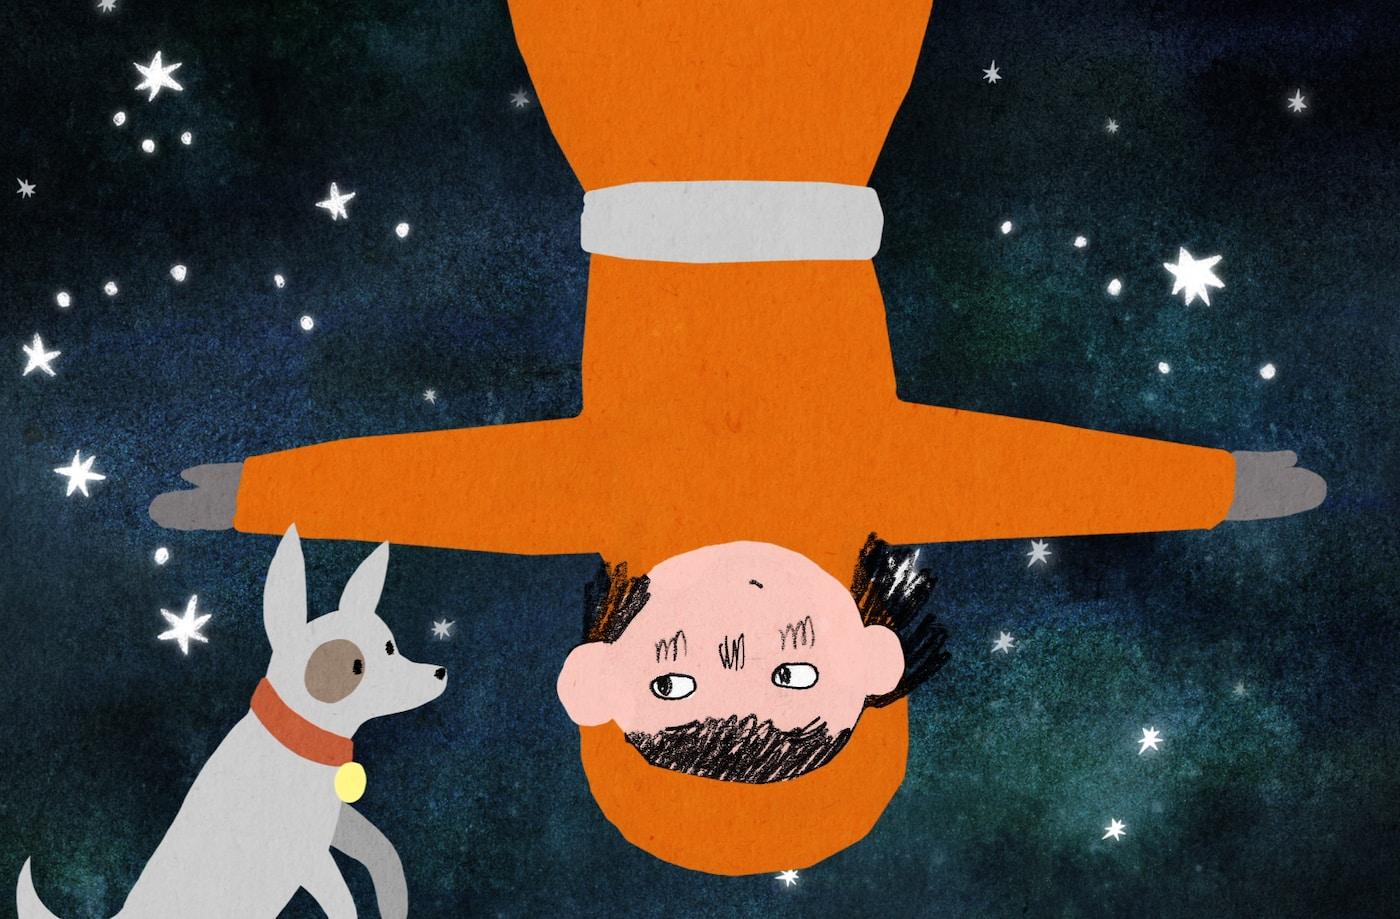 Festival of Animation mit Programm für Kinder in Berlin // HIMBEER